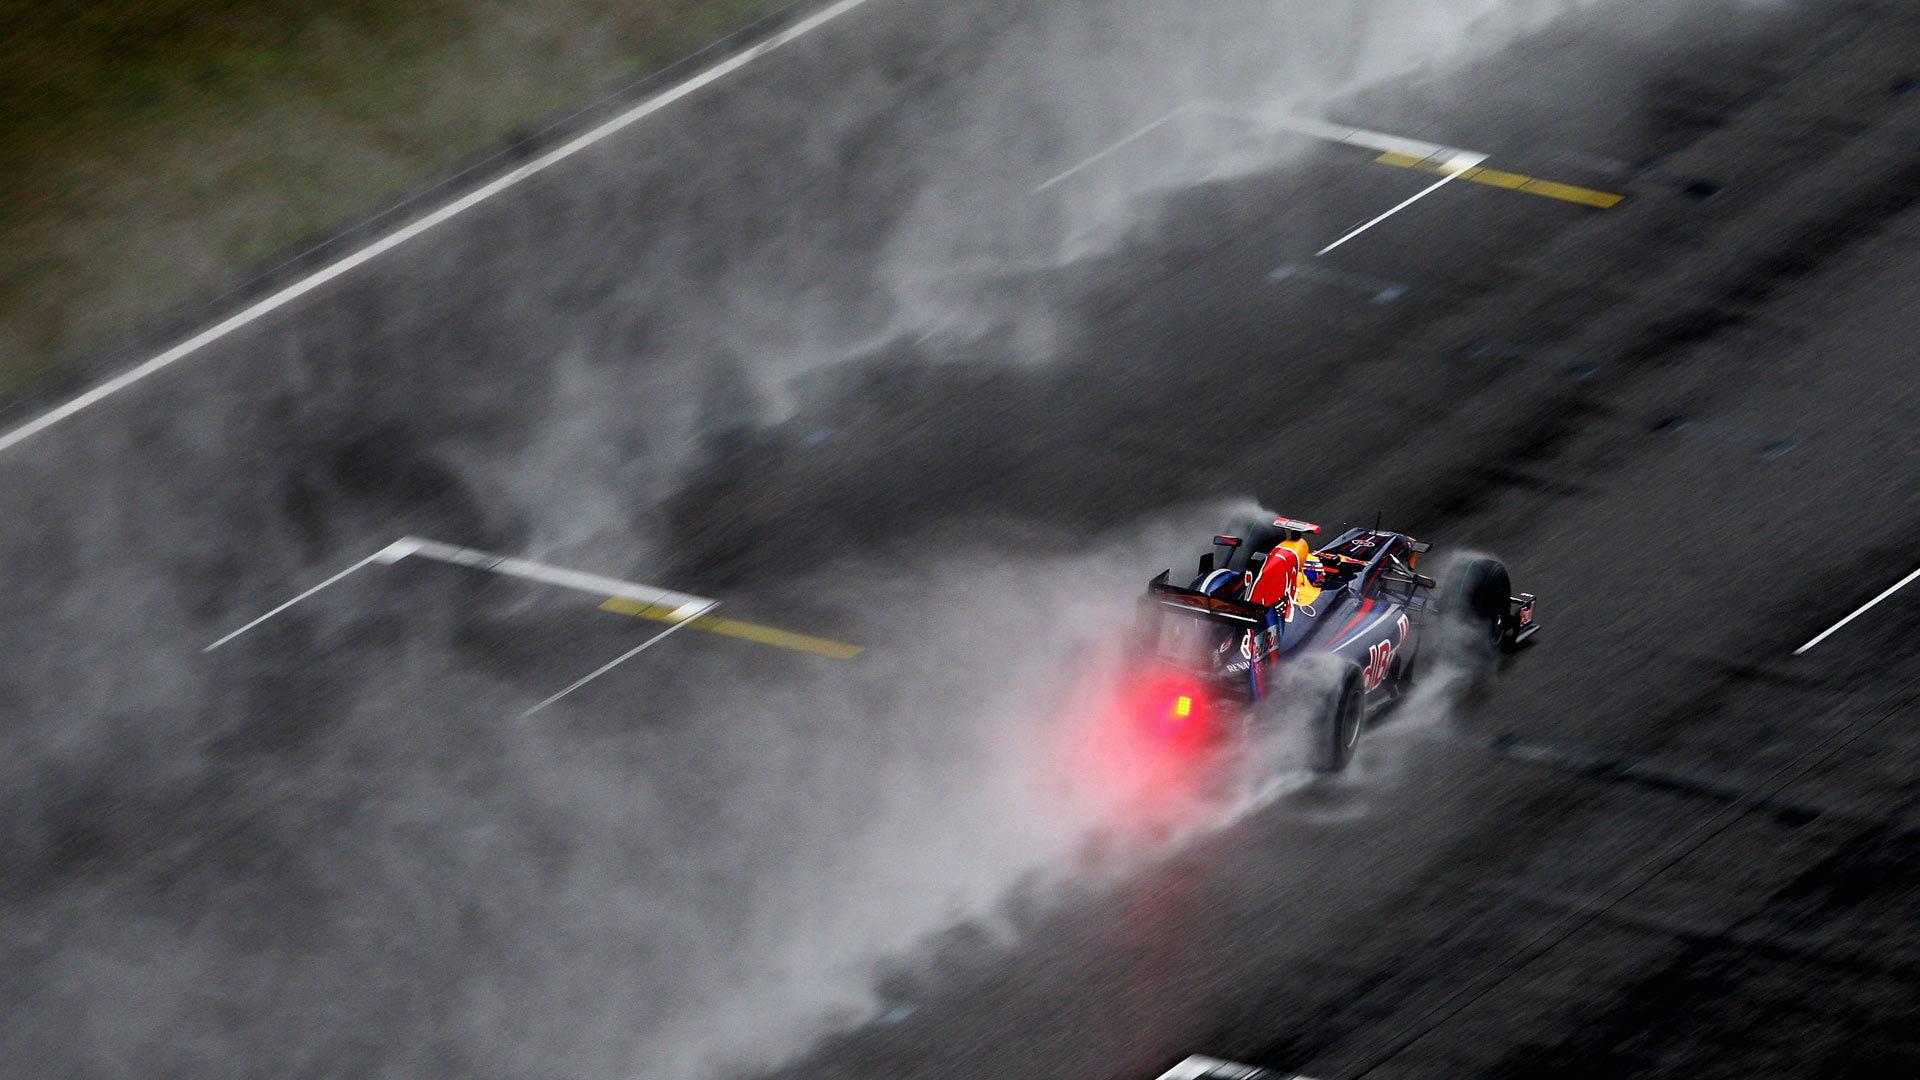 cool race wallpaper 45583